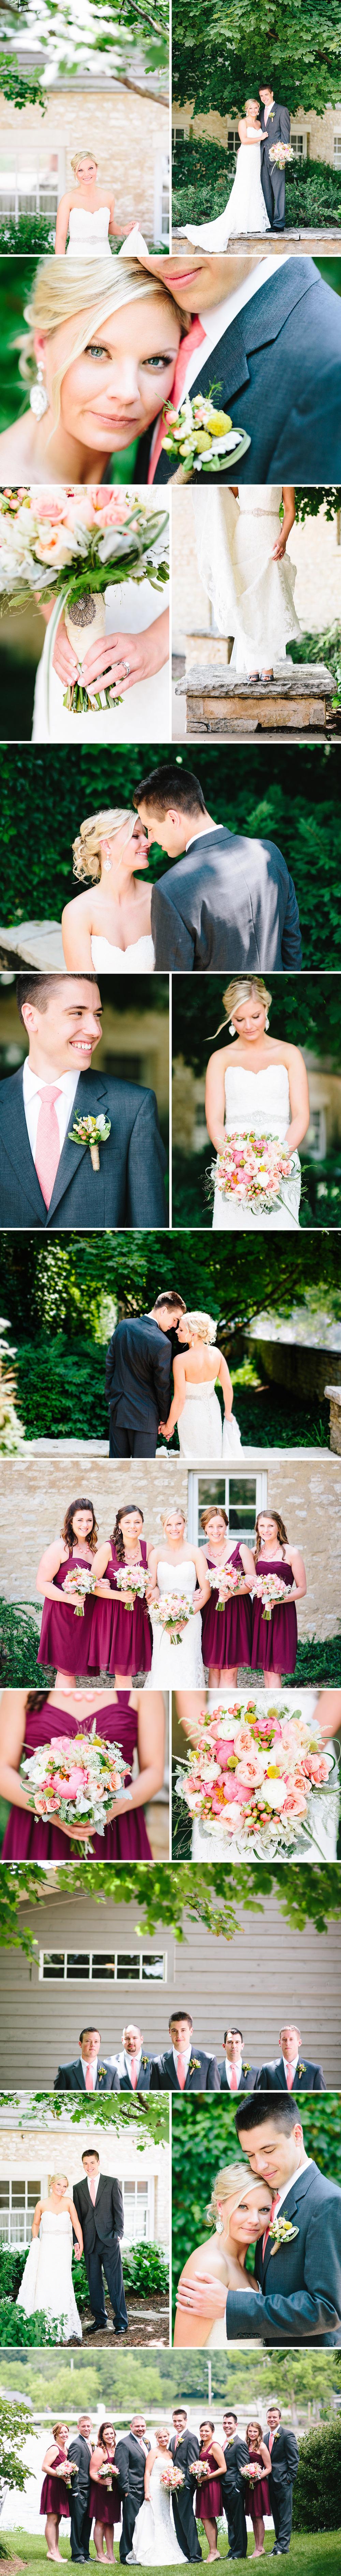 chicago-fine-art-wedding-photography-larson2